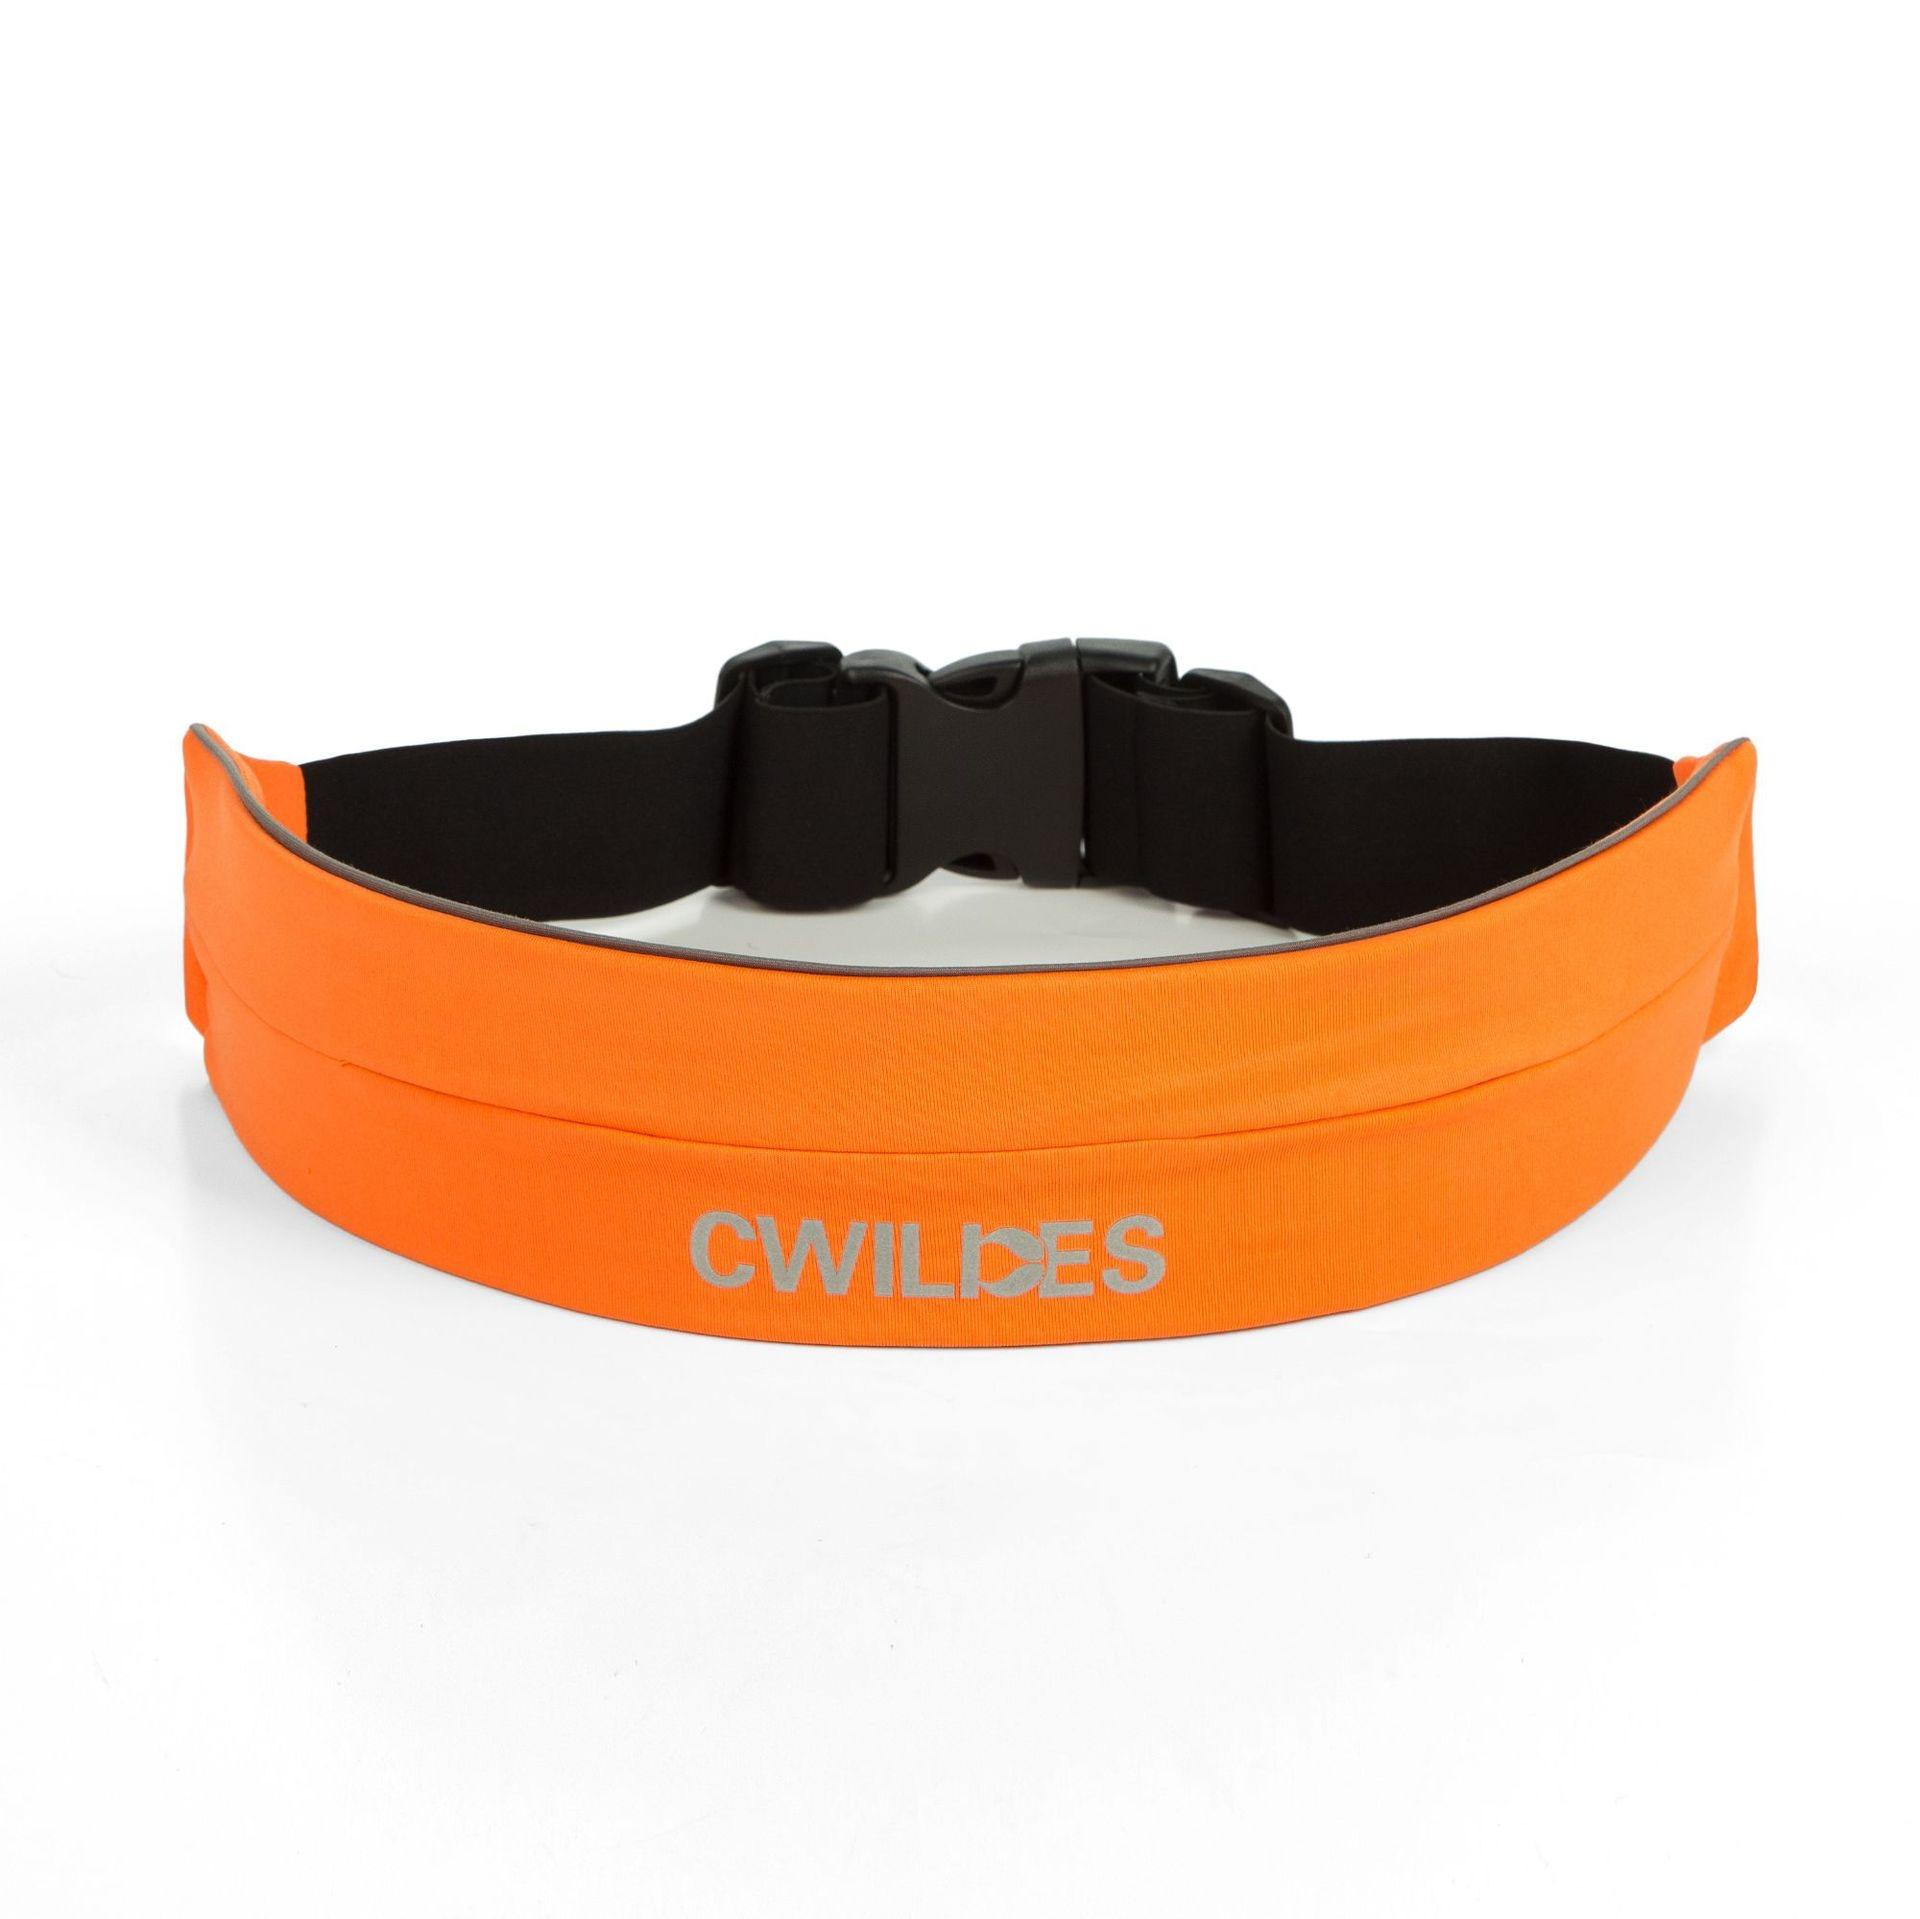 Cwilkes Outdoor Elasticity Sports Waist Pack Fitness Running Belt Riding Buckle Anti-Theft Waterproof Phone Bag